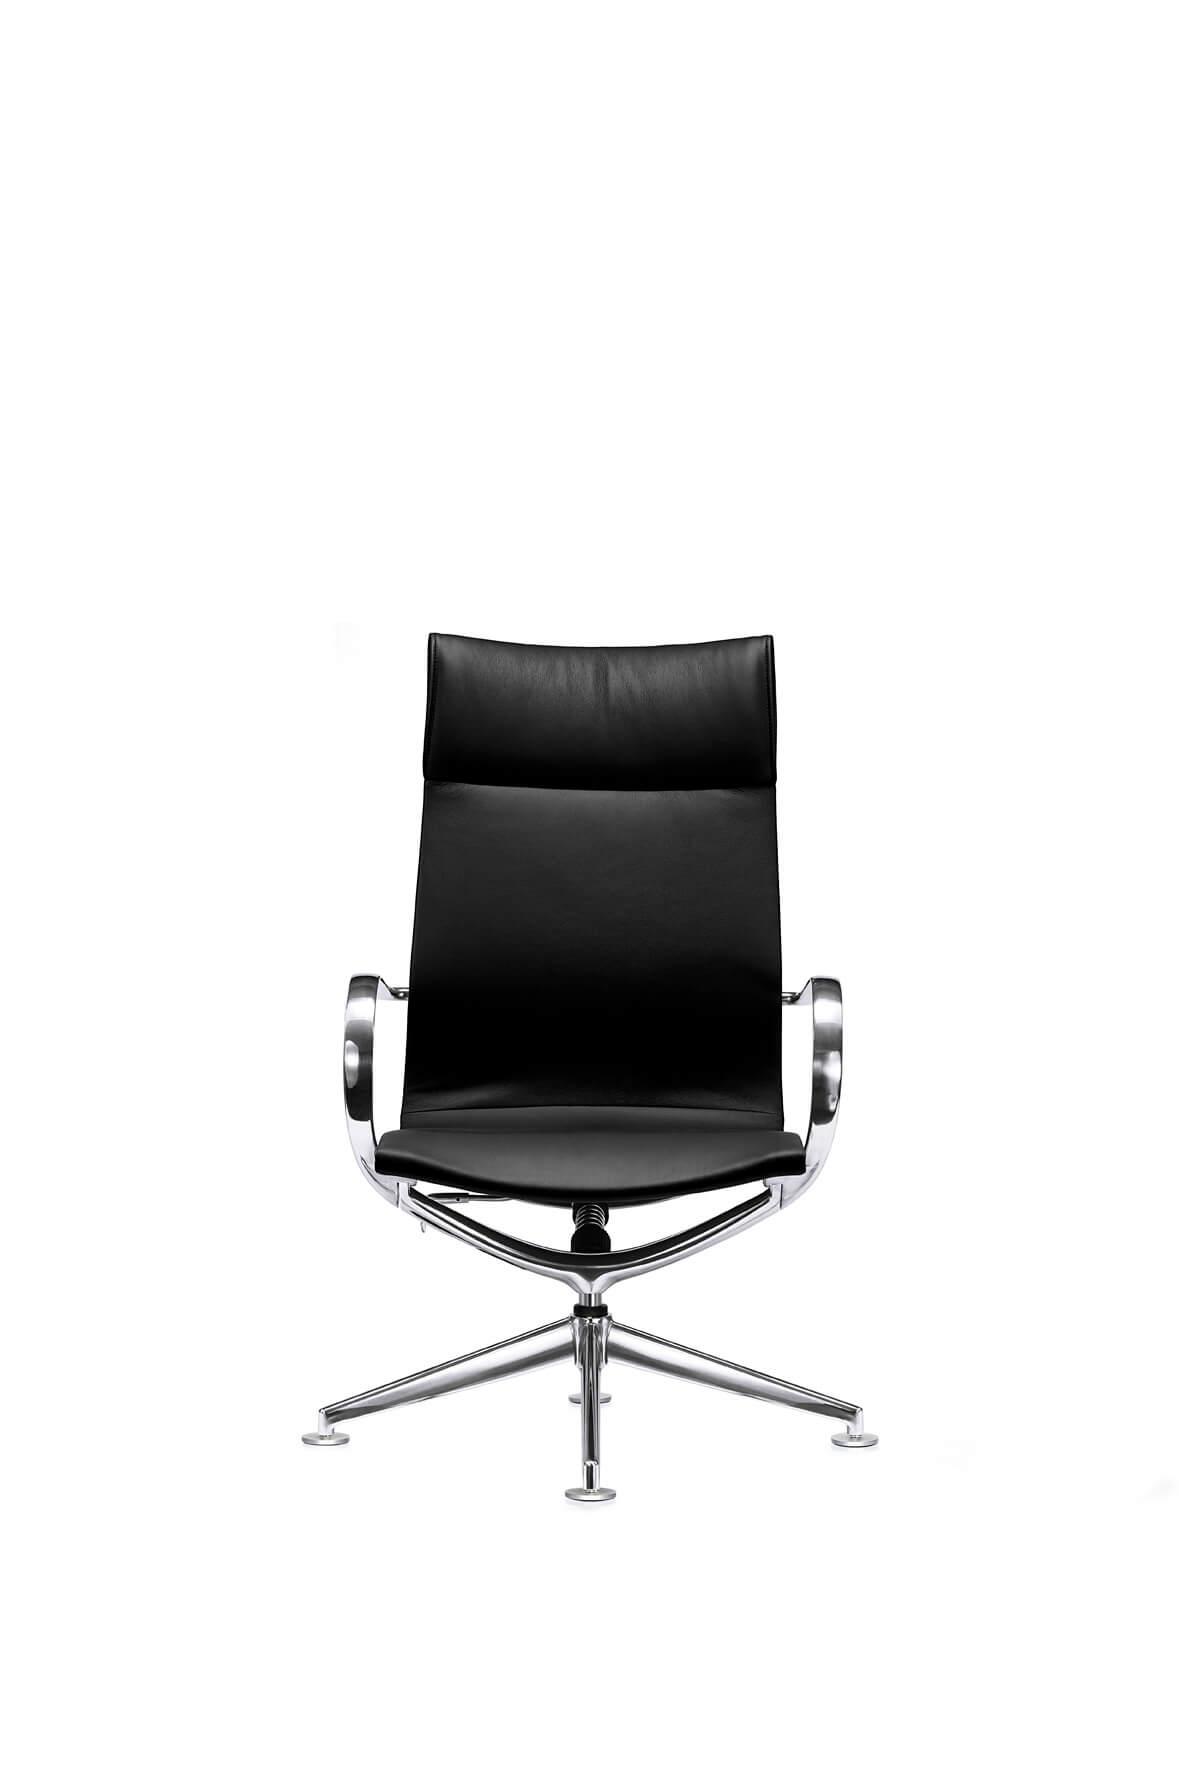 Asis Design Mercury Lounge [01] Brokx projectinrichting